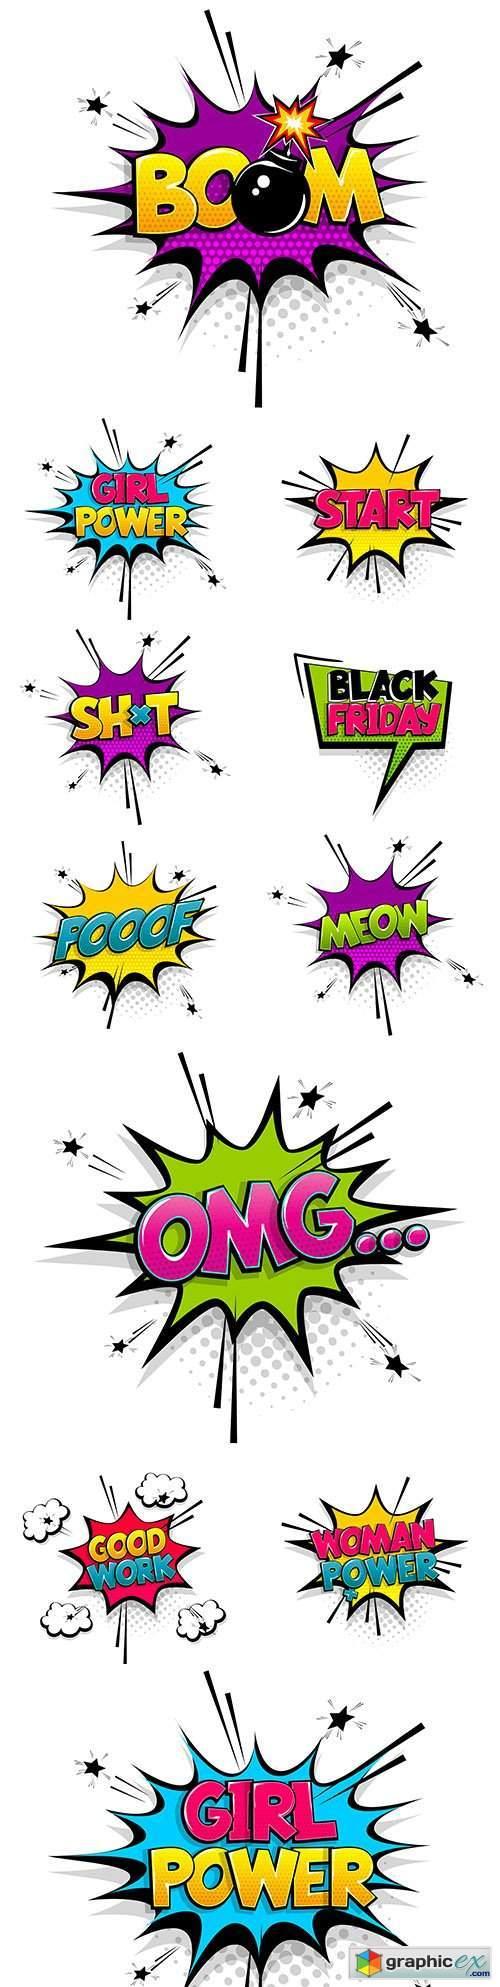 Comic text cartoon bubble pop art font halftone vintage